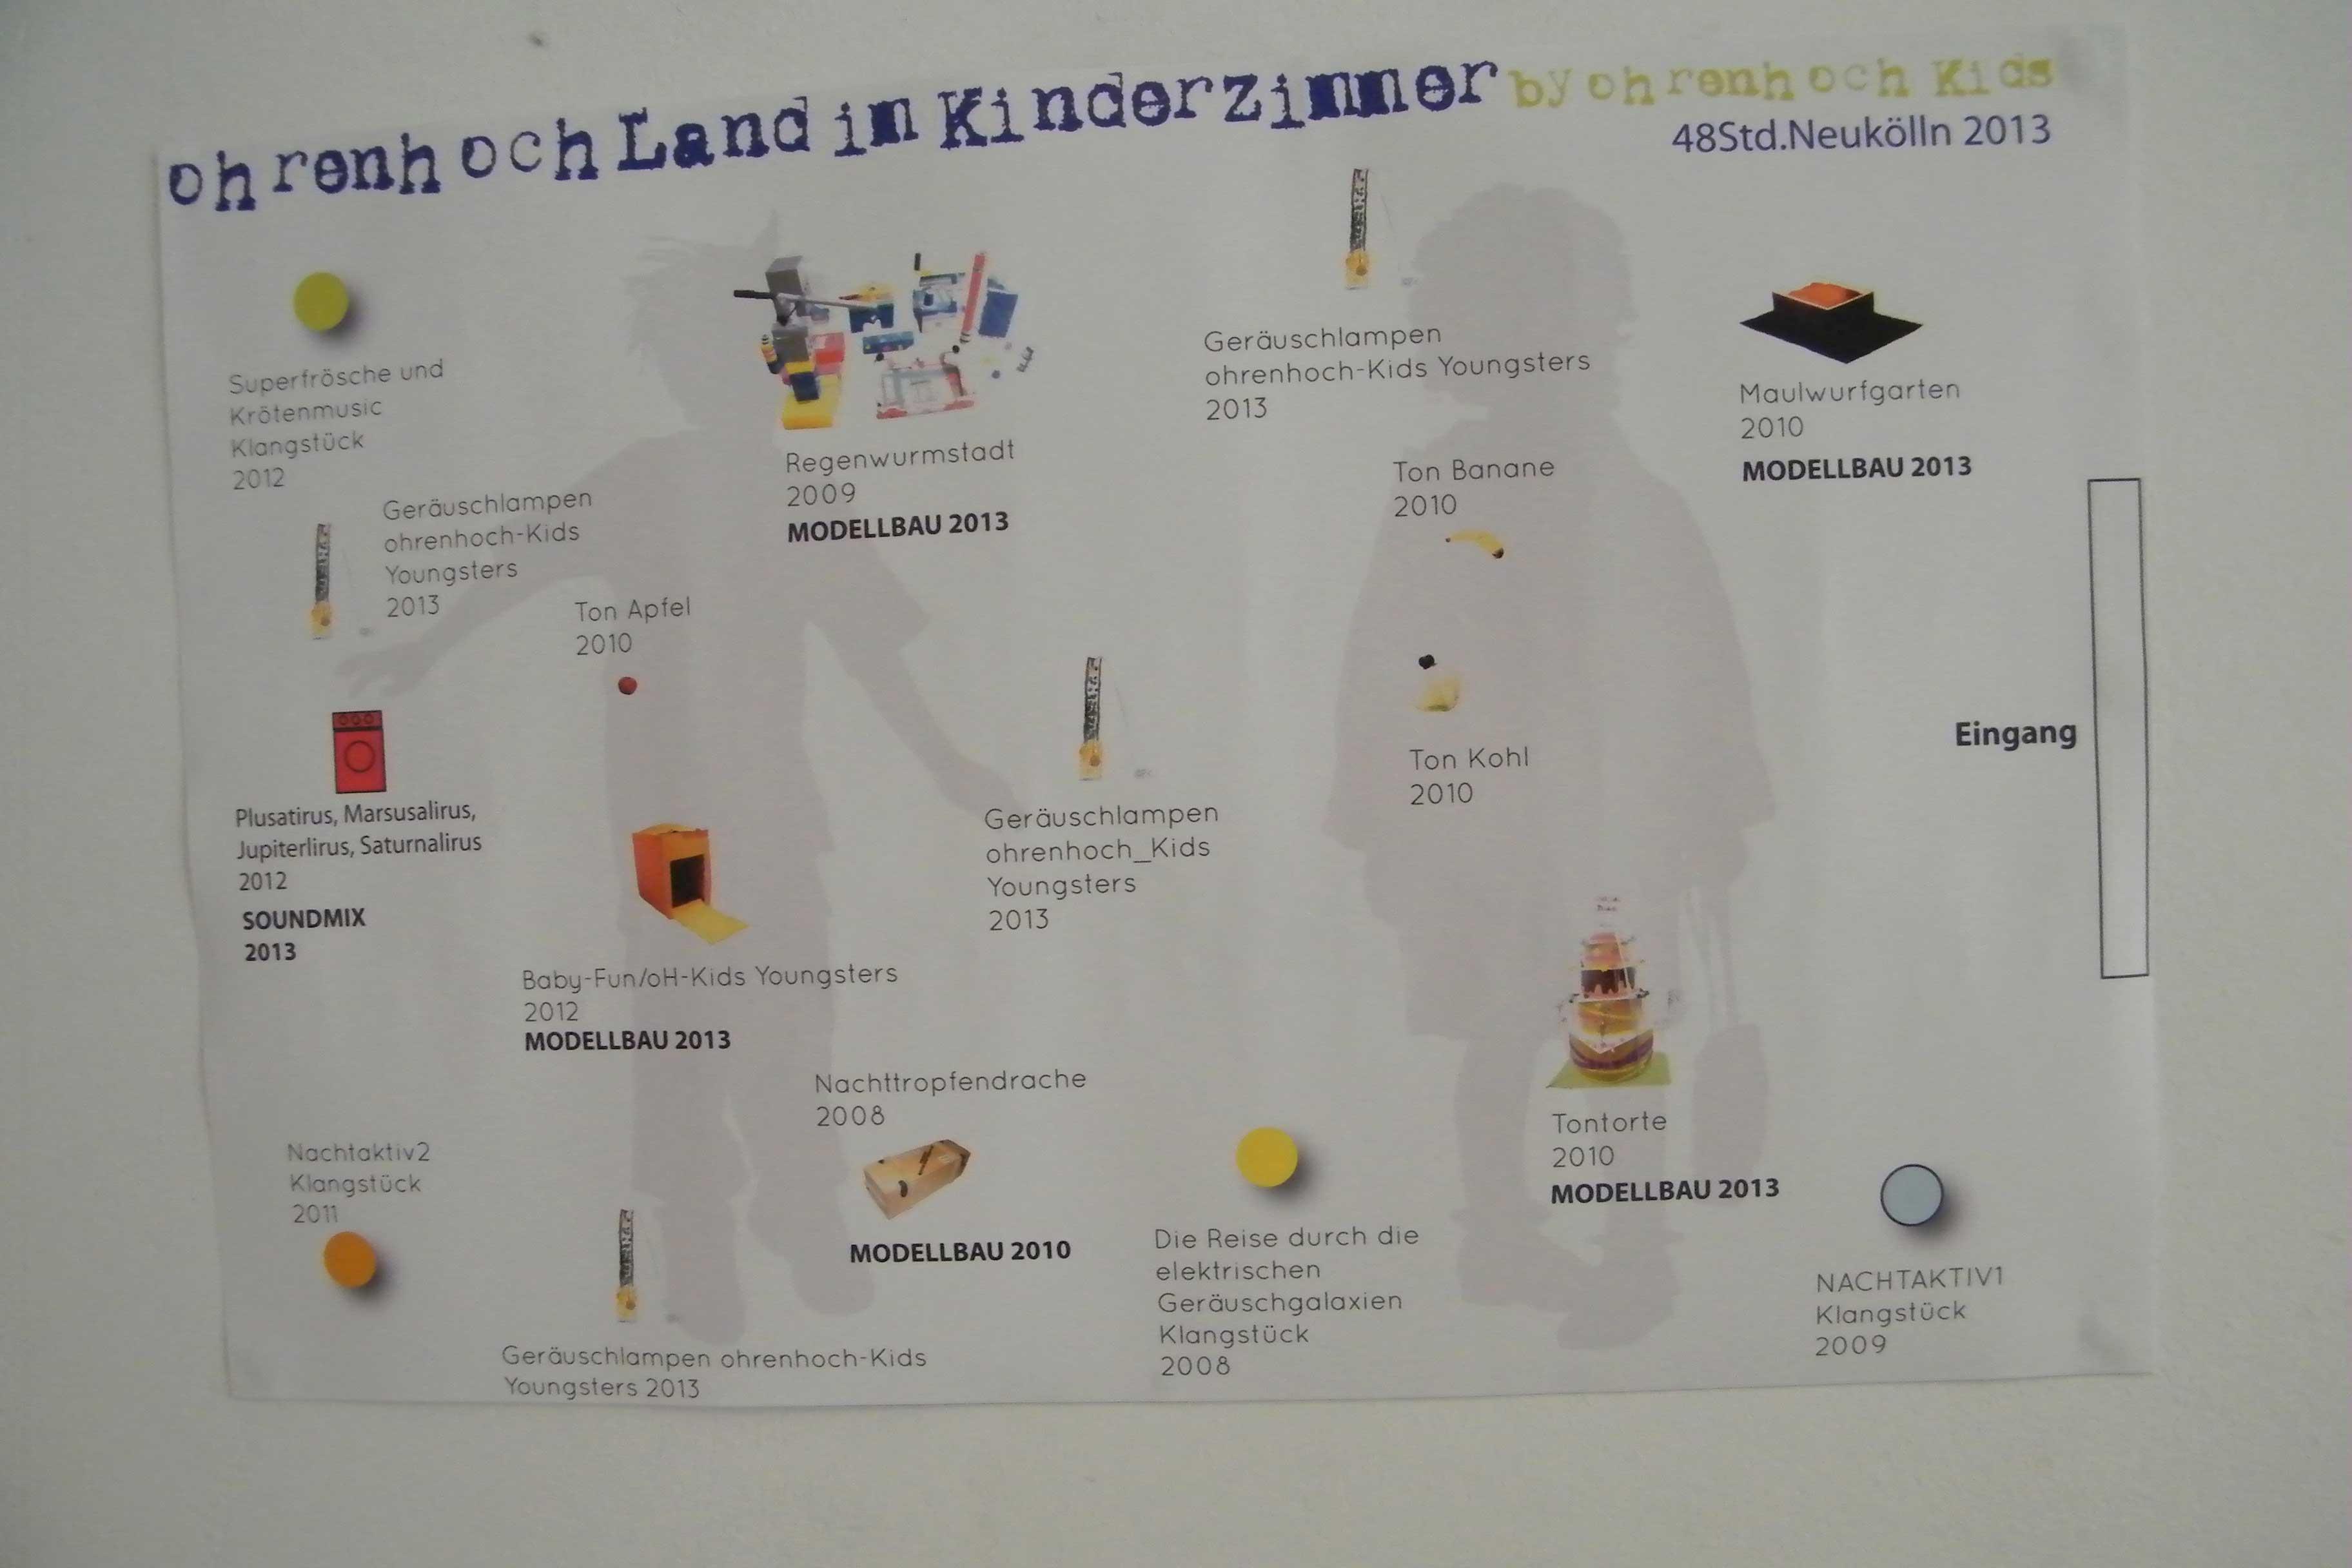 'ohrenhochLand im Kinderzimmer' 2013